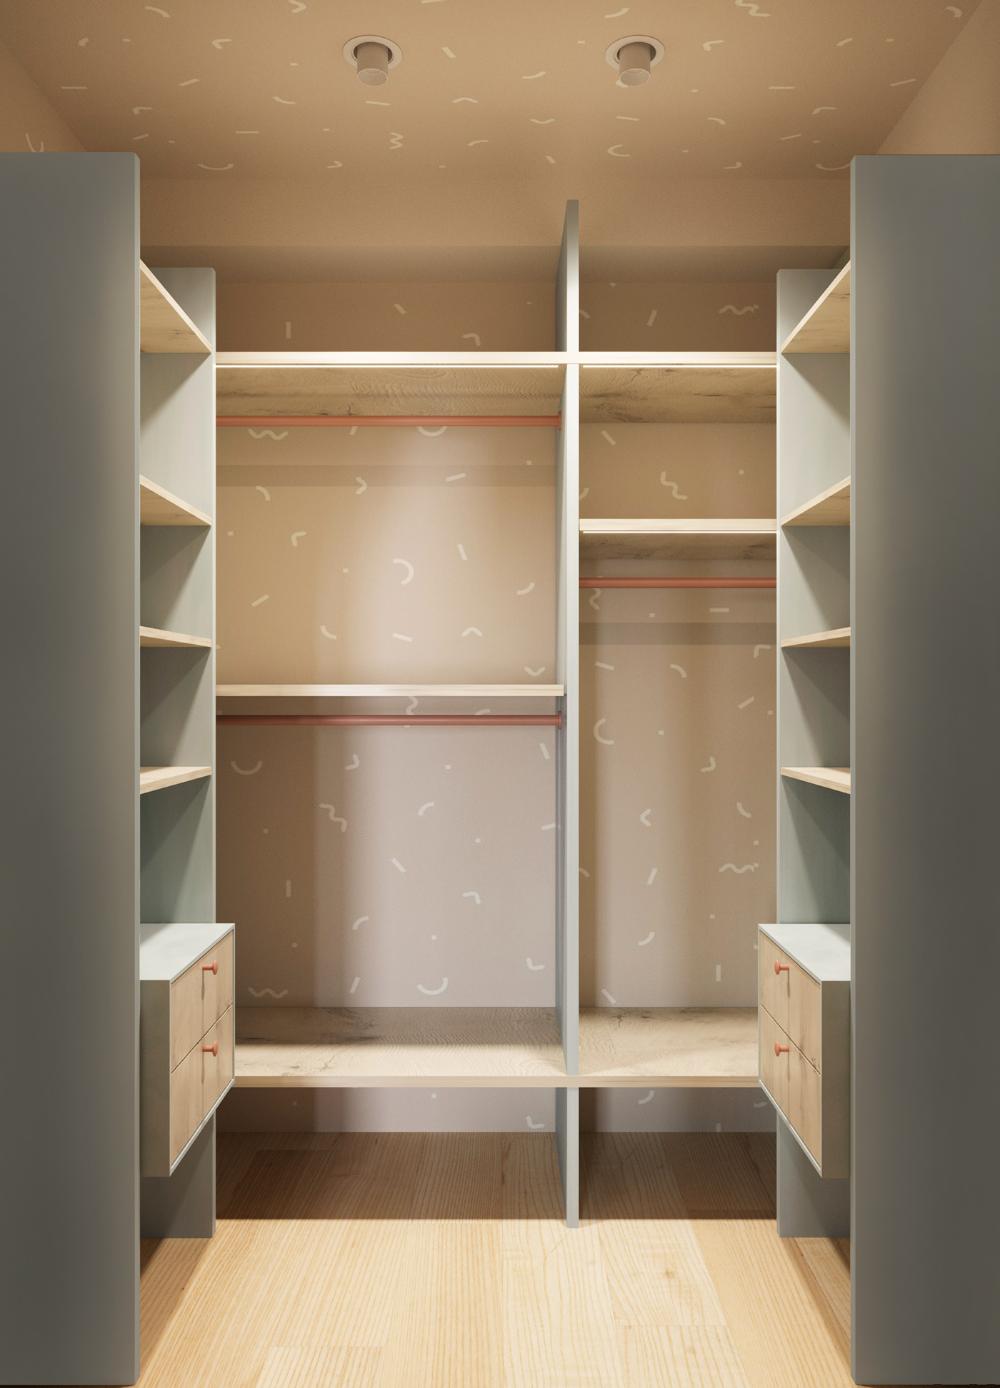 Autodesk Room Design: Autodesk 3ds Max, Home Interior